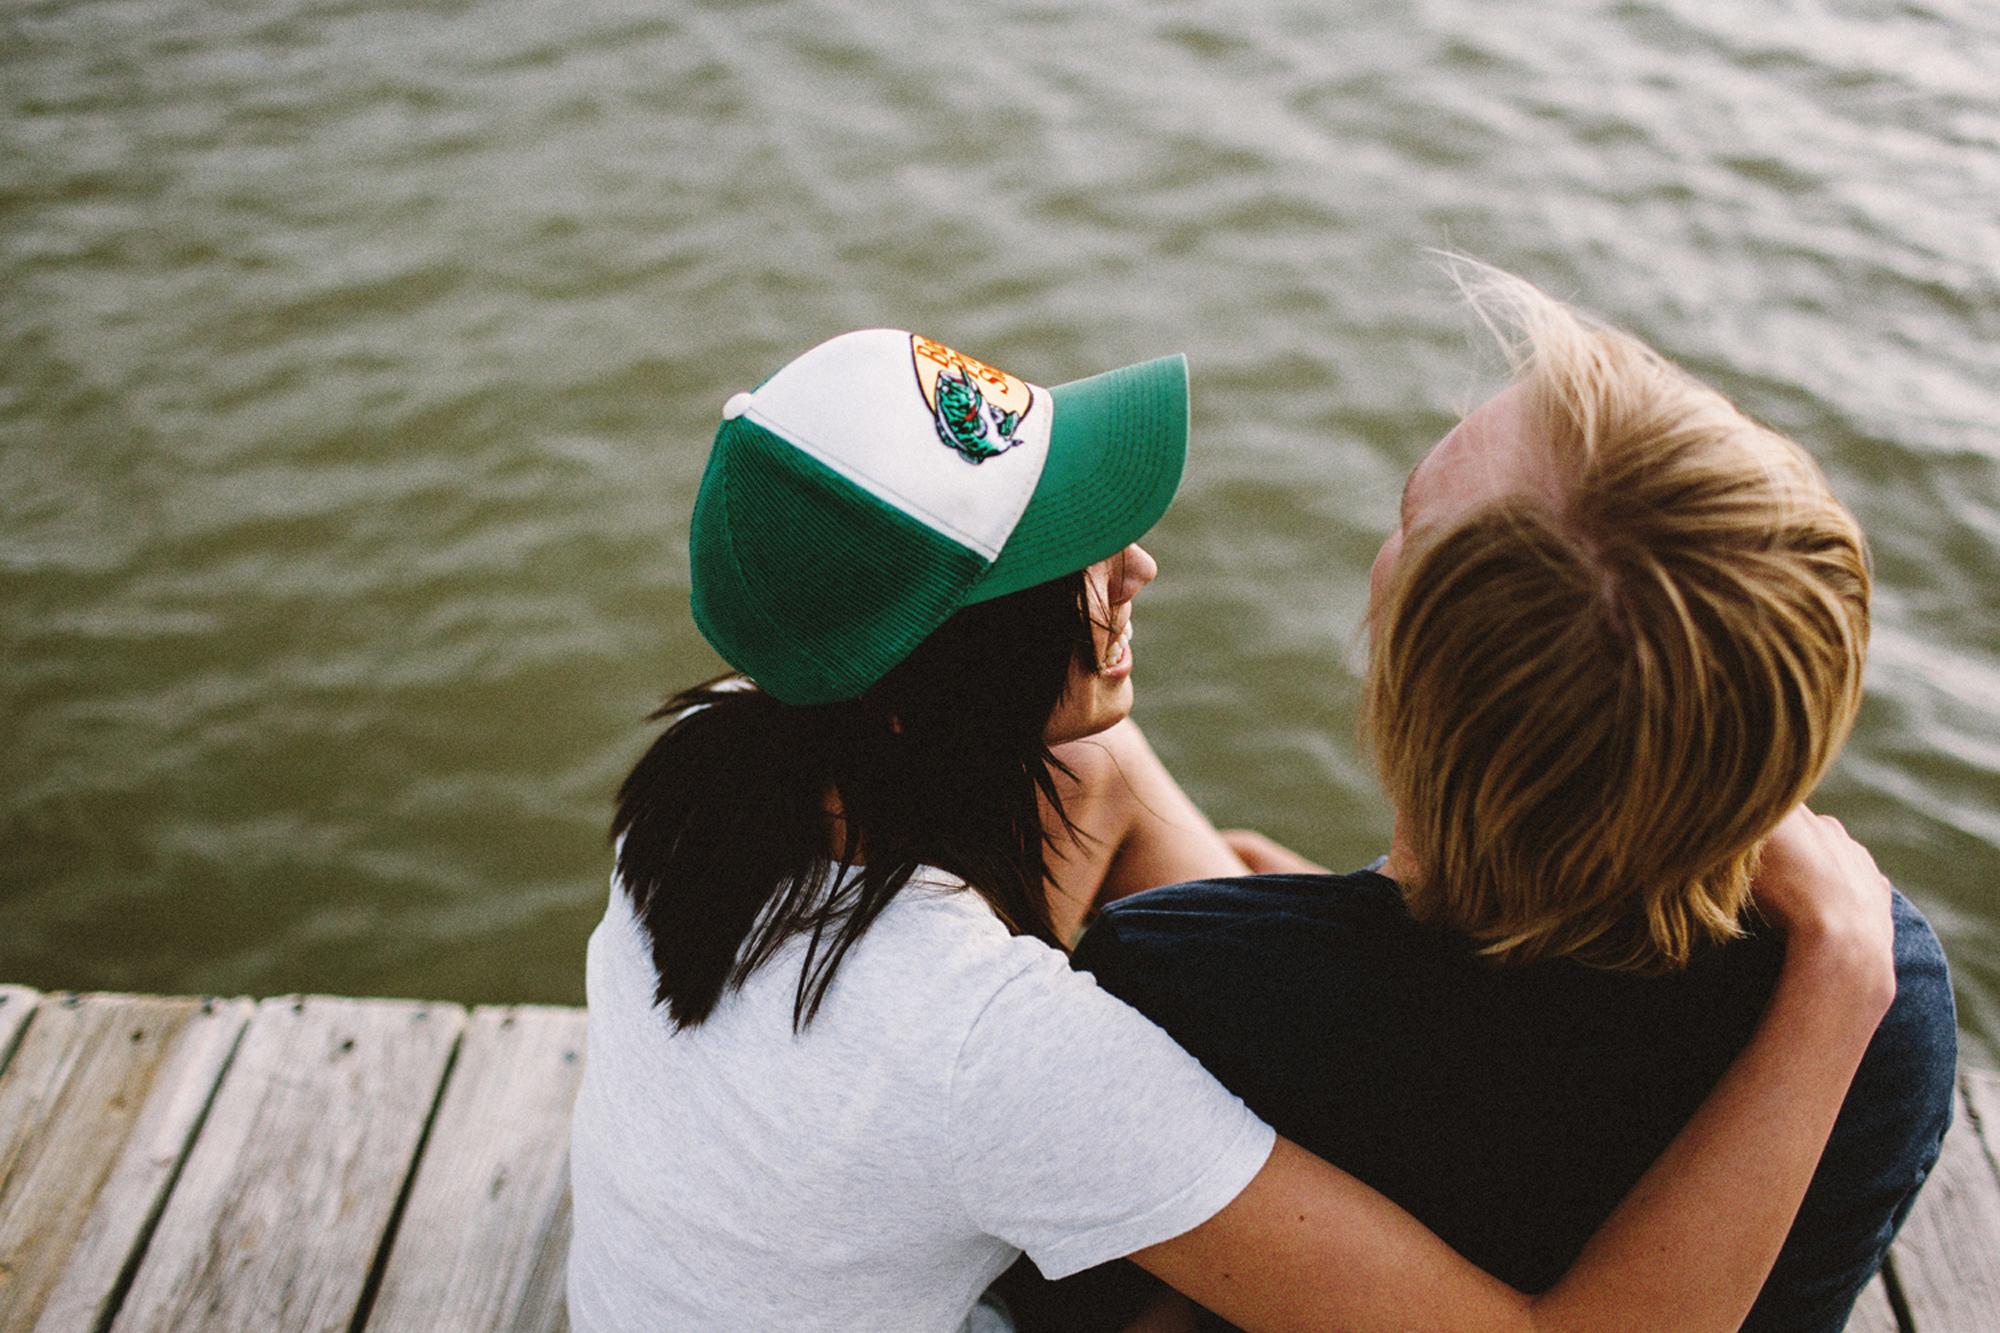 062-love-on-the-lake.jpg